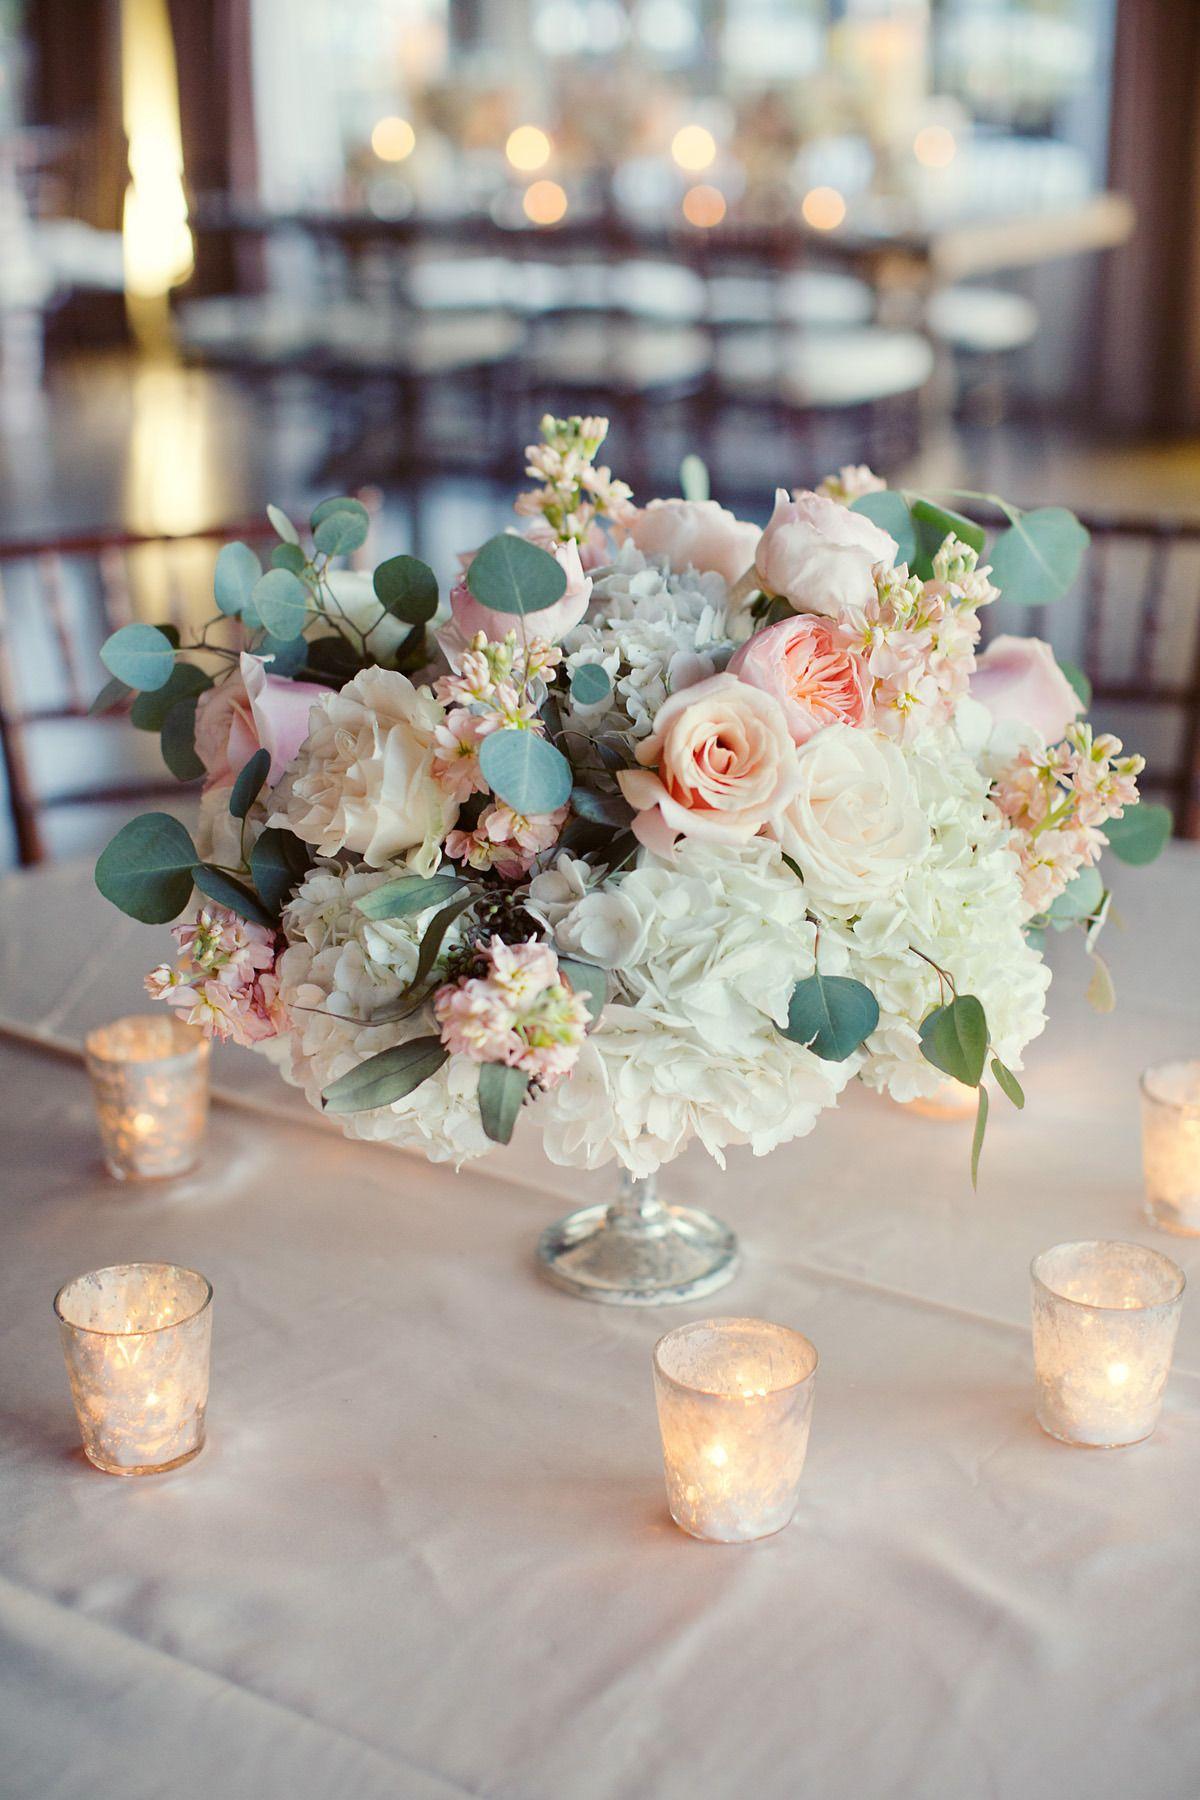 Urban English GardenInspired Wedding Wedding table